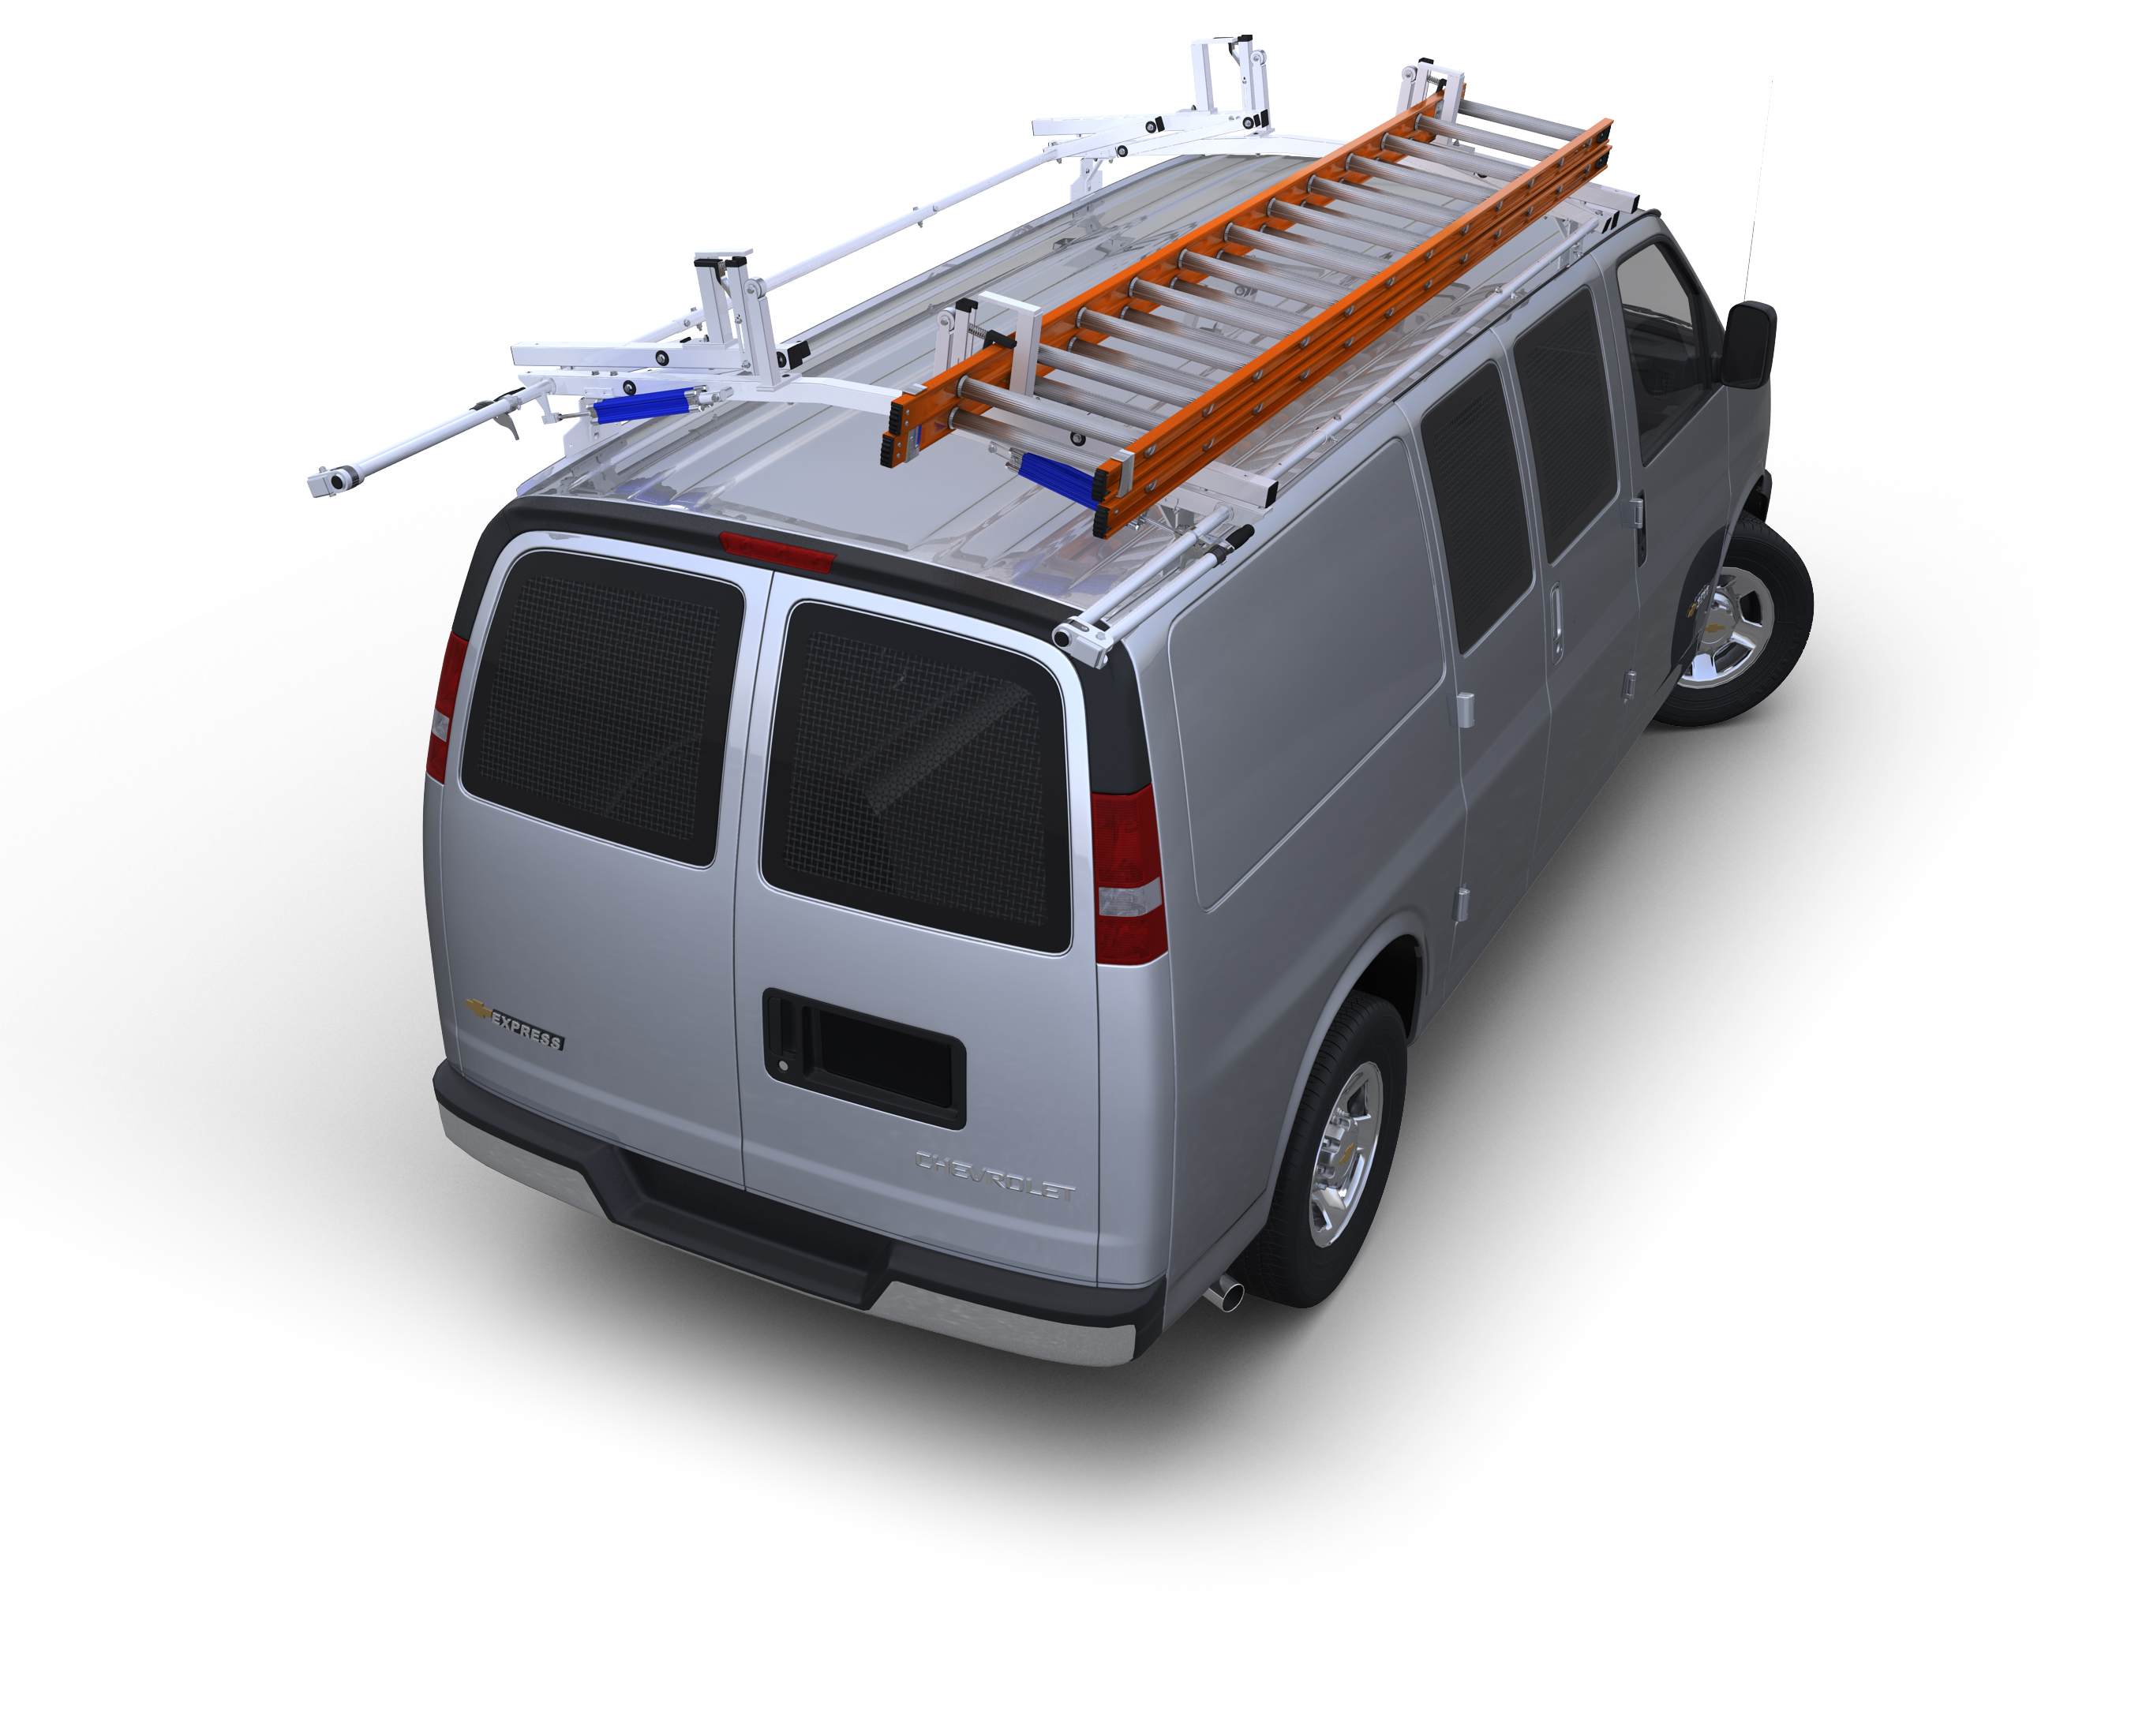 Shelf Tower for High Roof Vans